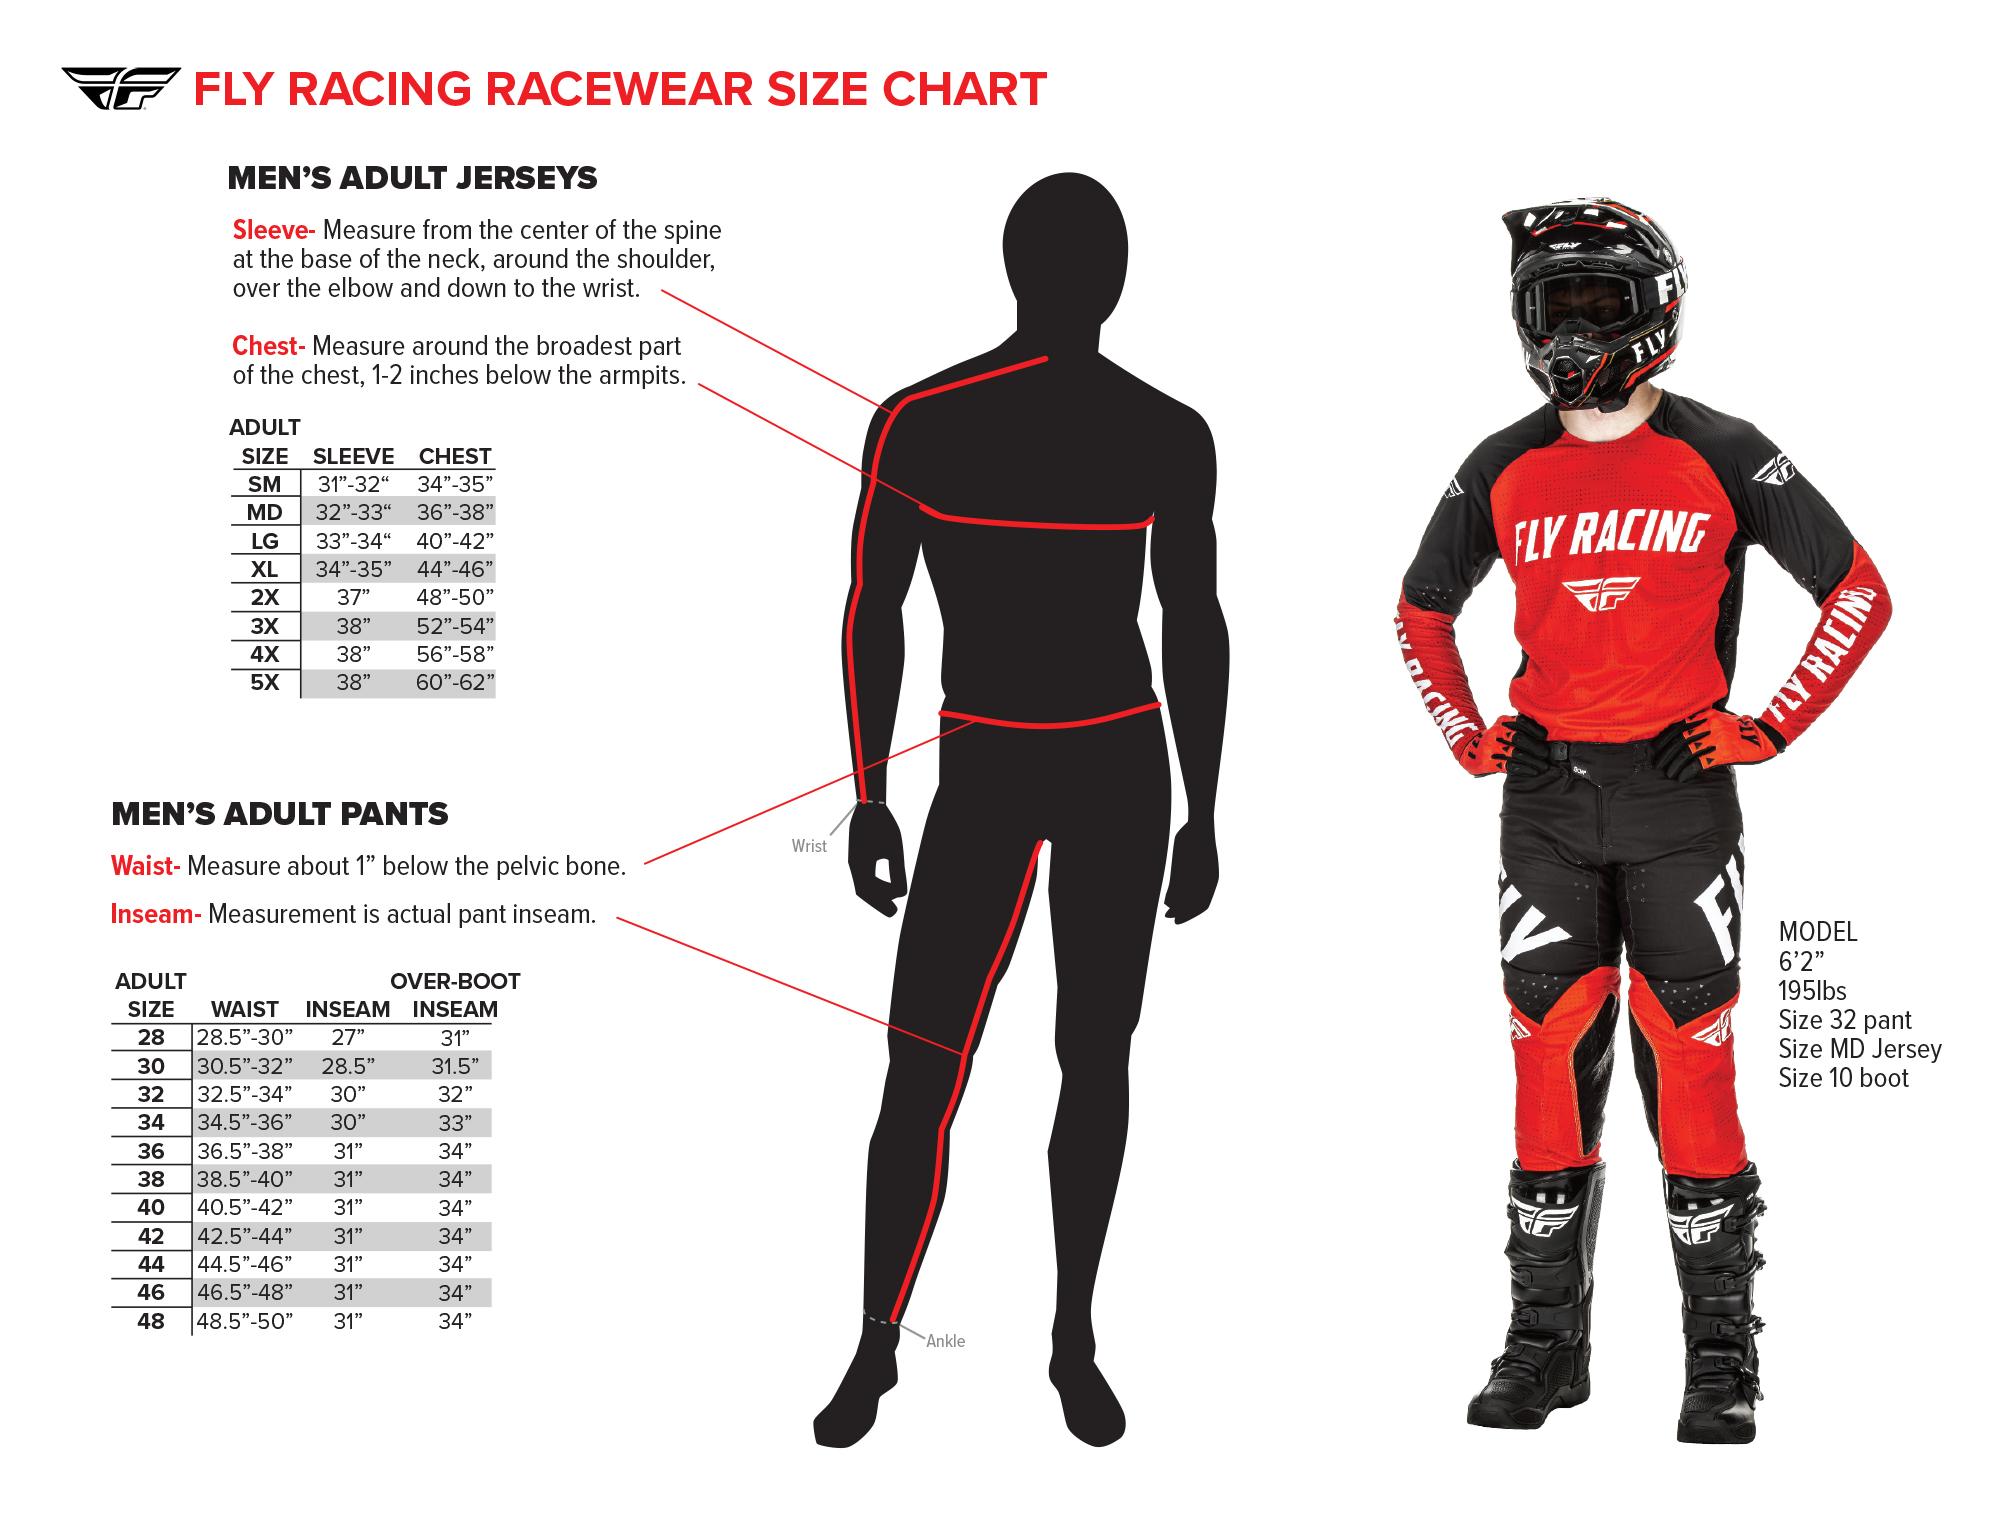 sizechart-adultracewear.jpg